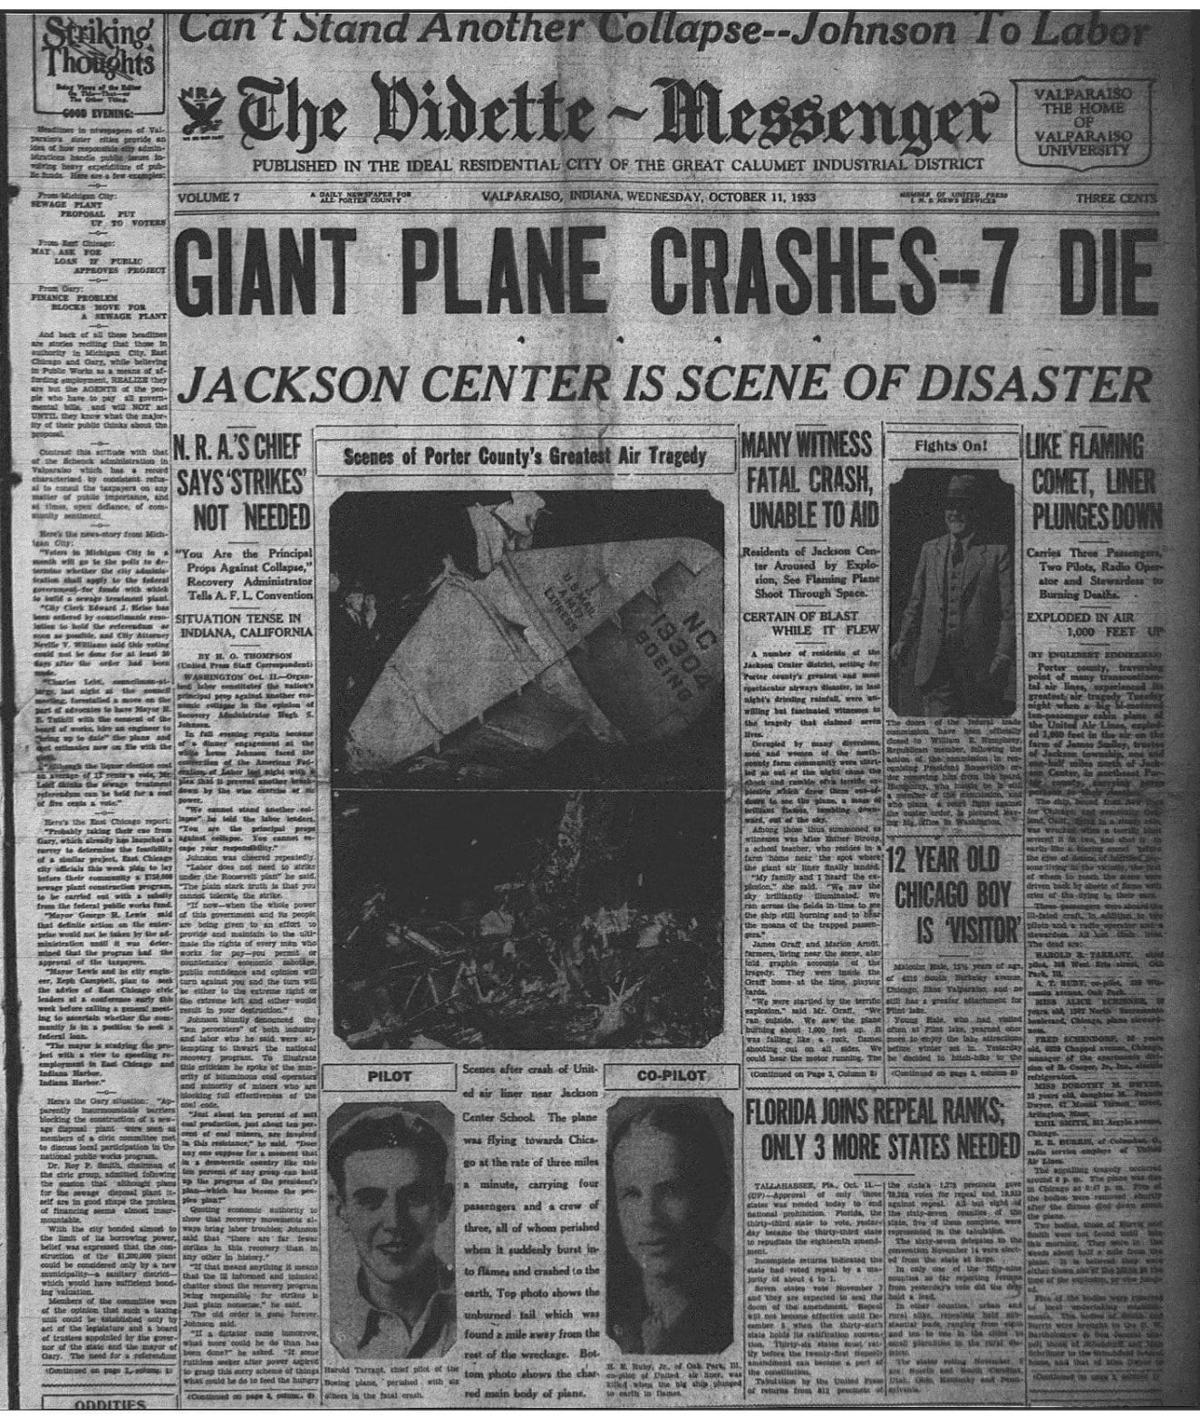 Chesterton plane crash